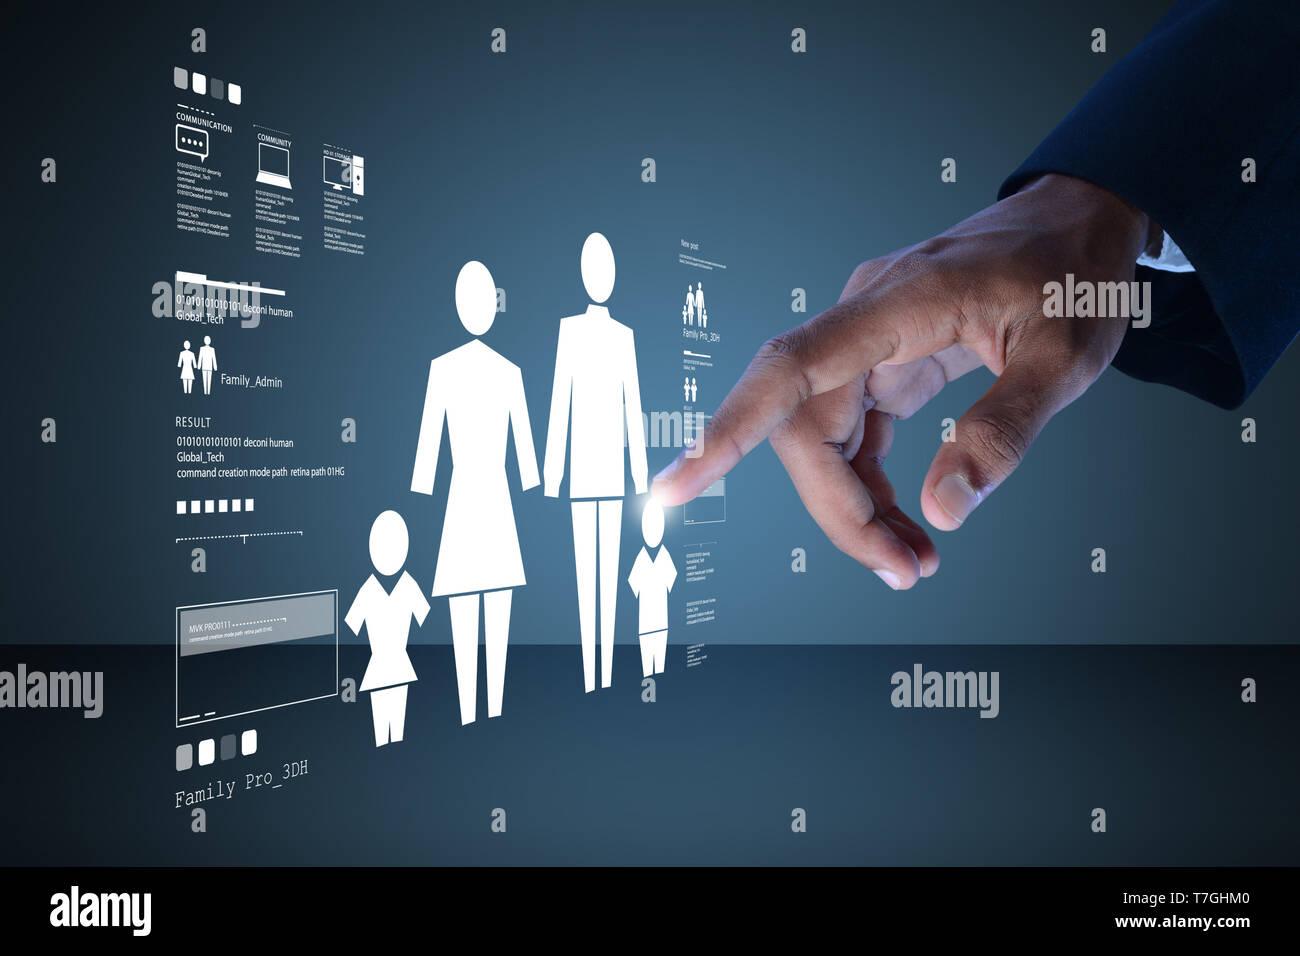 Man shows family icon - Stock Image